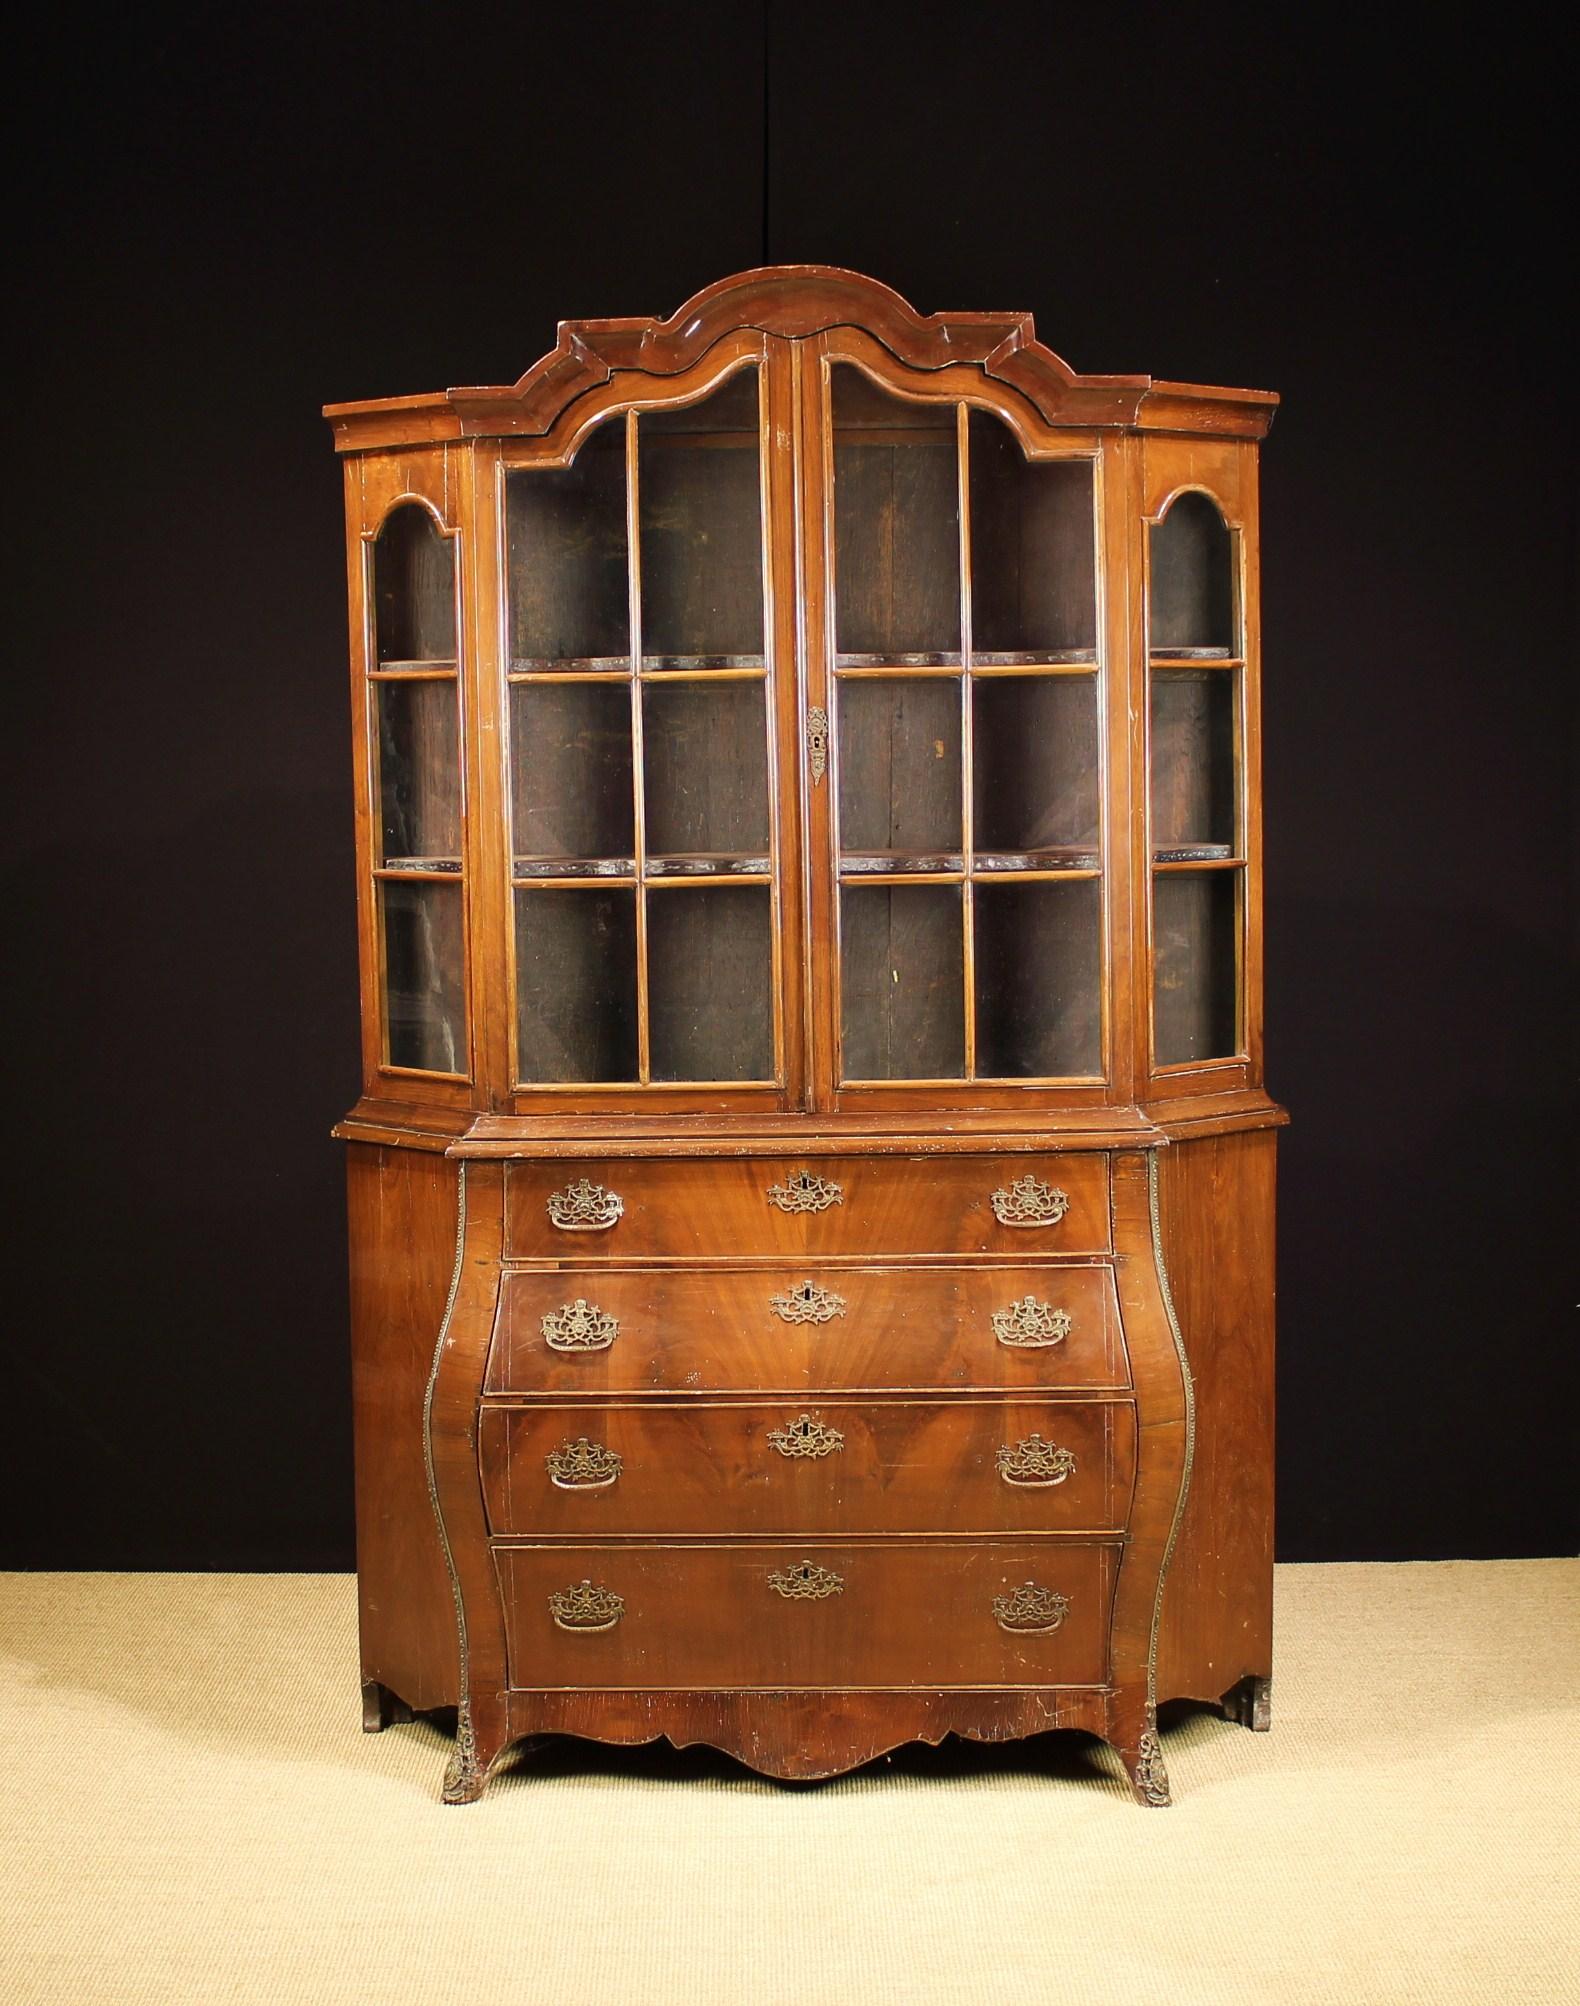 A Late 19th Century Dutch Vitrine Cabinet. - Image 2 of 2